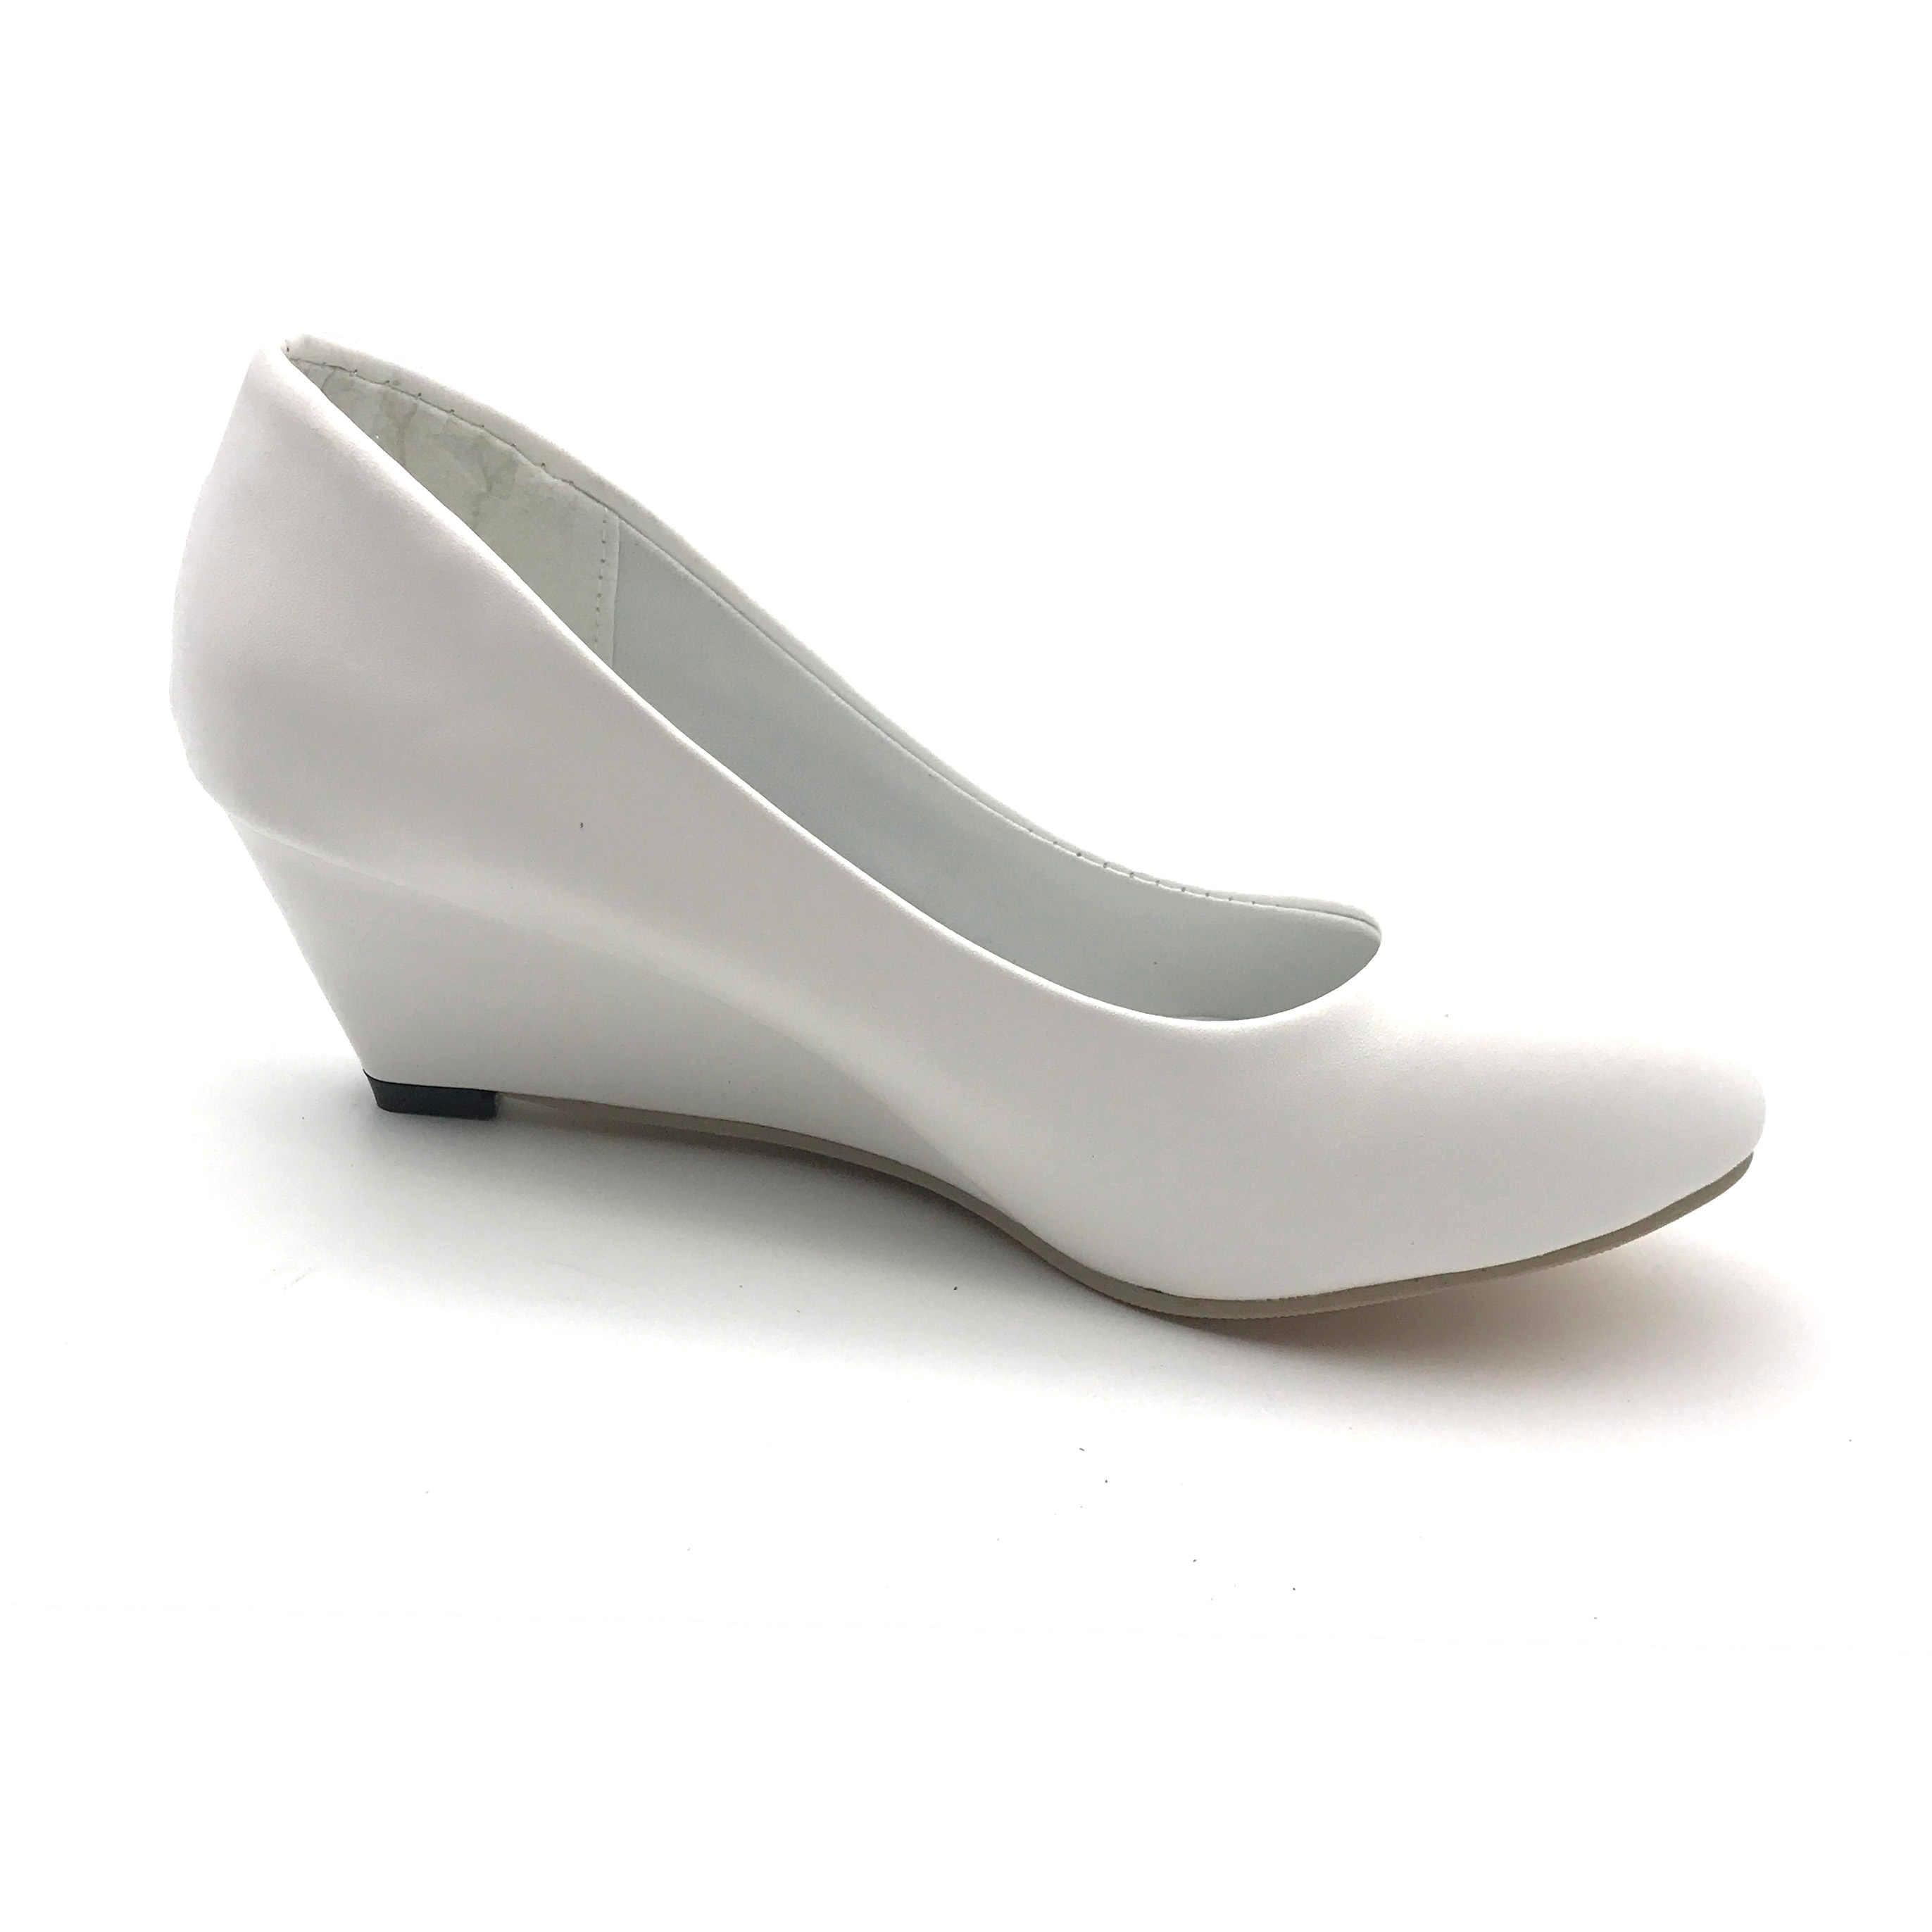 ffe24de563 Spring Autumn Office Lady Shoes Woman Wedges Pumps High Heels White Wedding  Shoes Women Boat Shoes Ladies Basic Pump 28H18